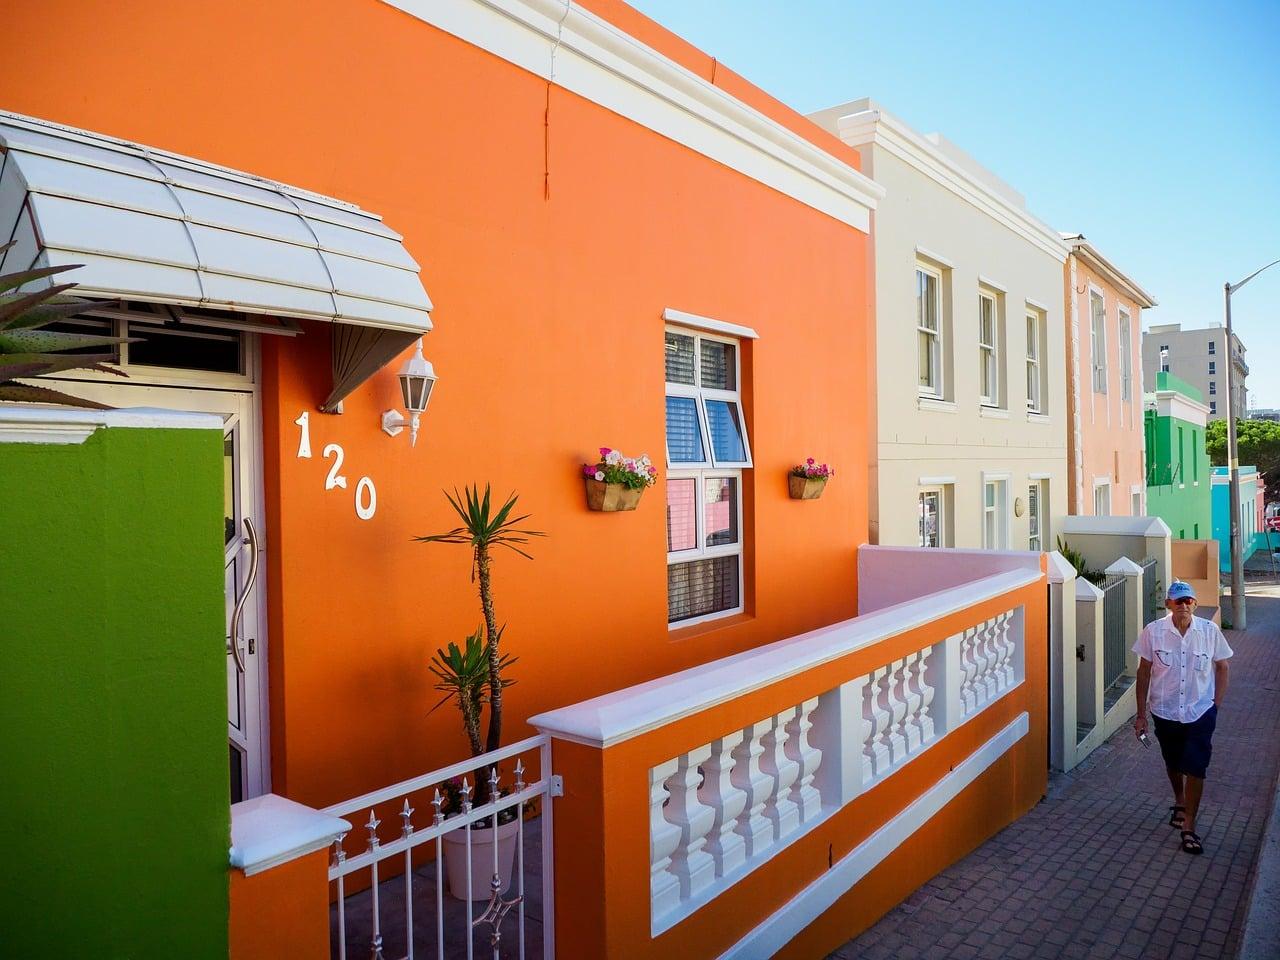 bairro para visitar na África do sul